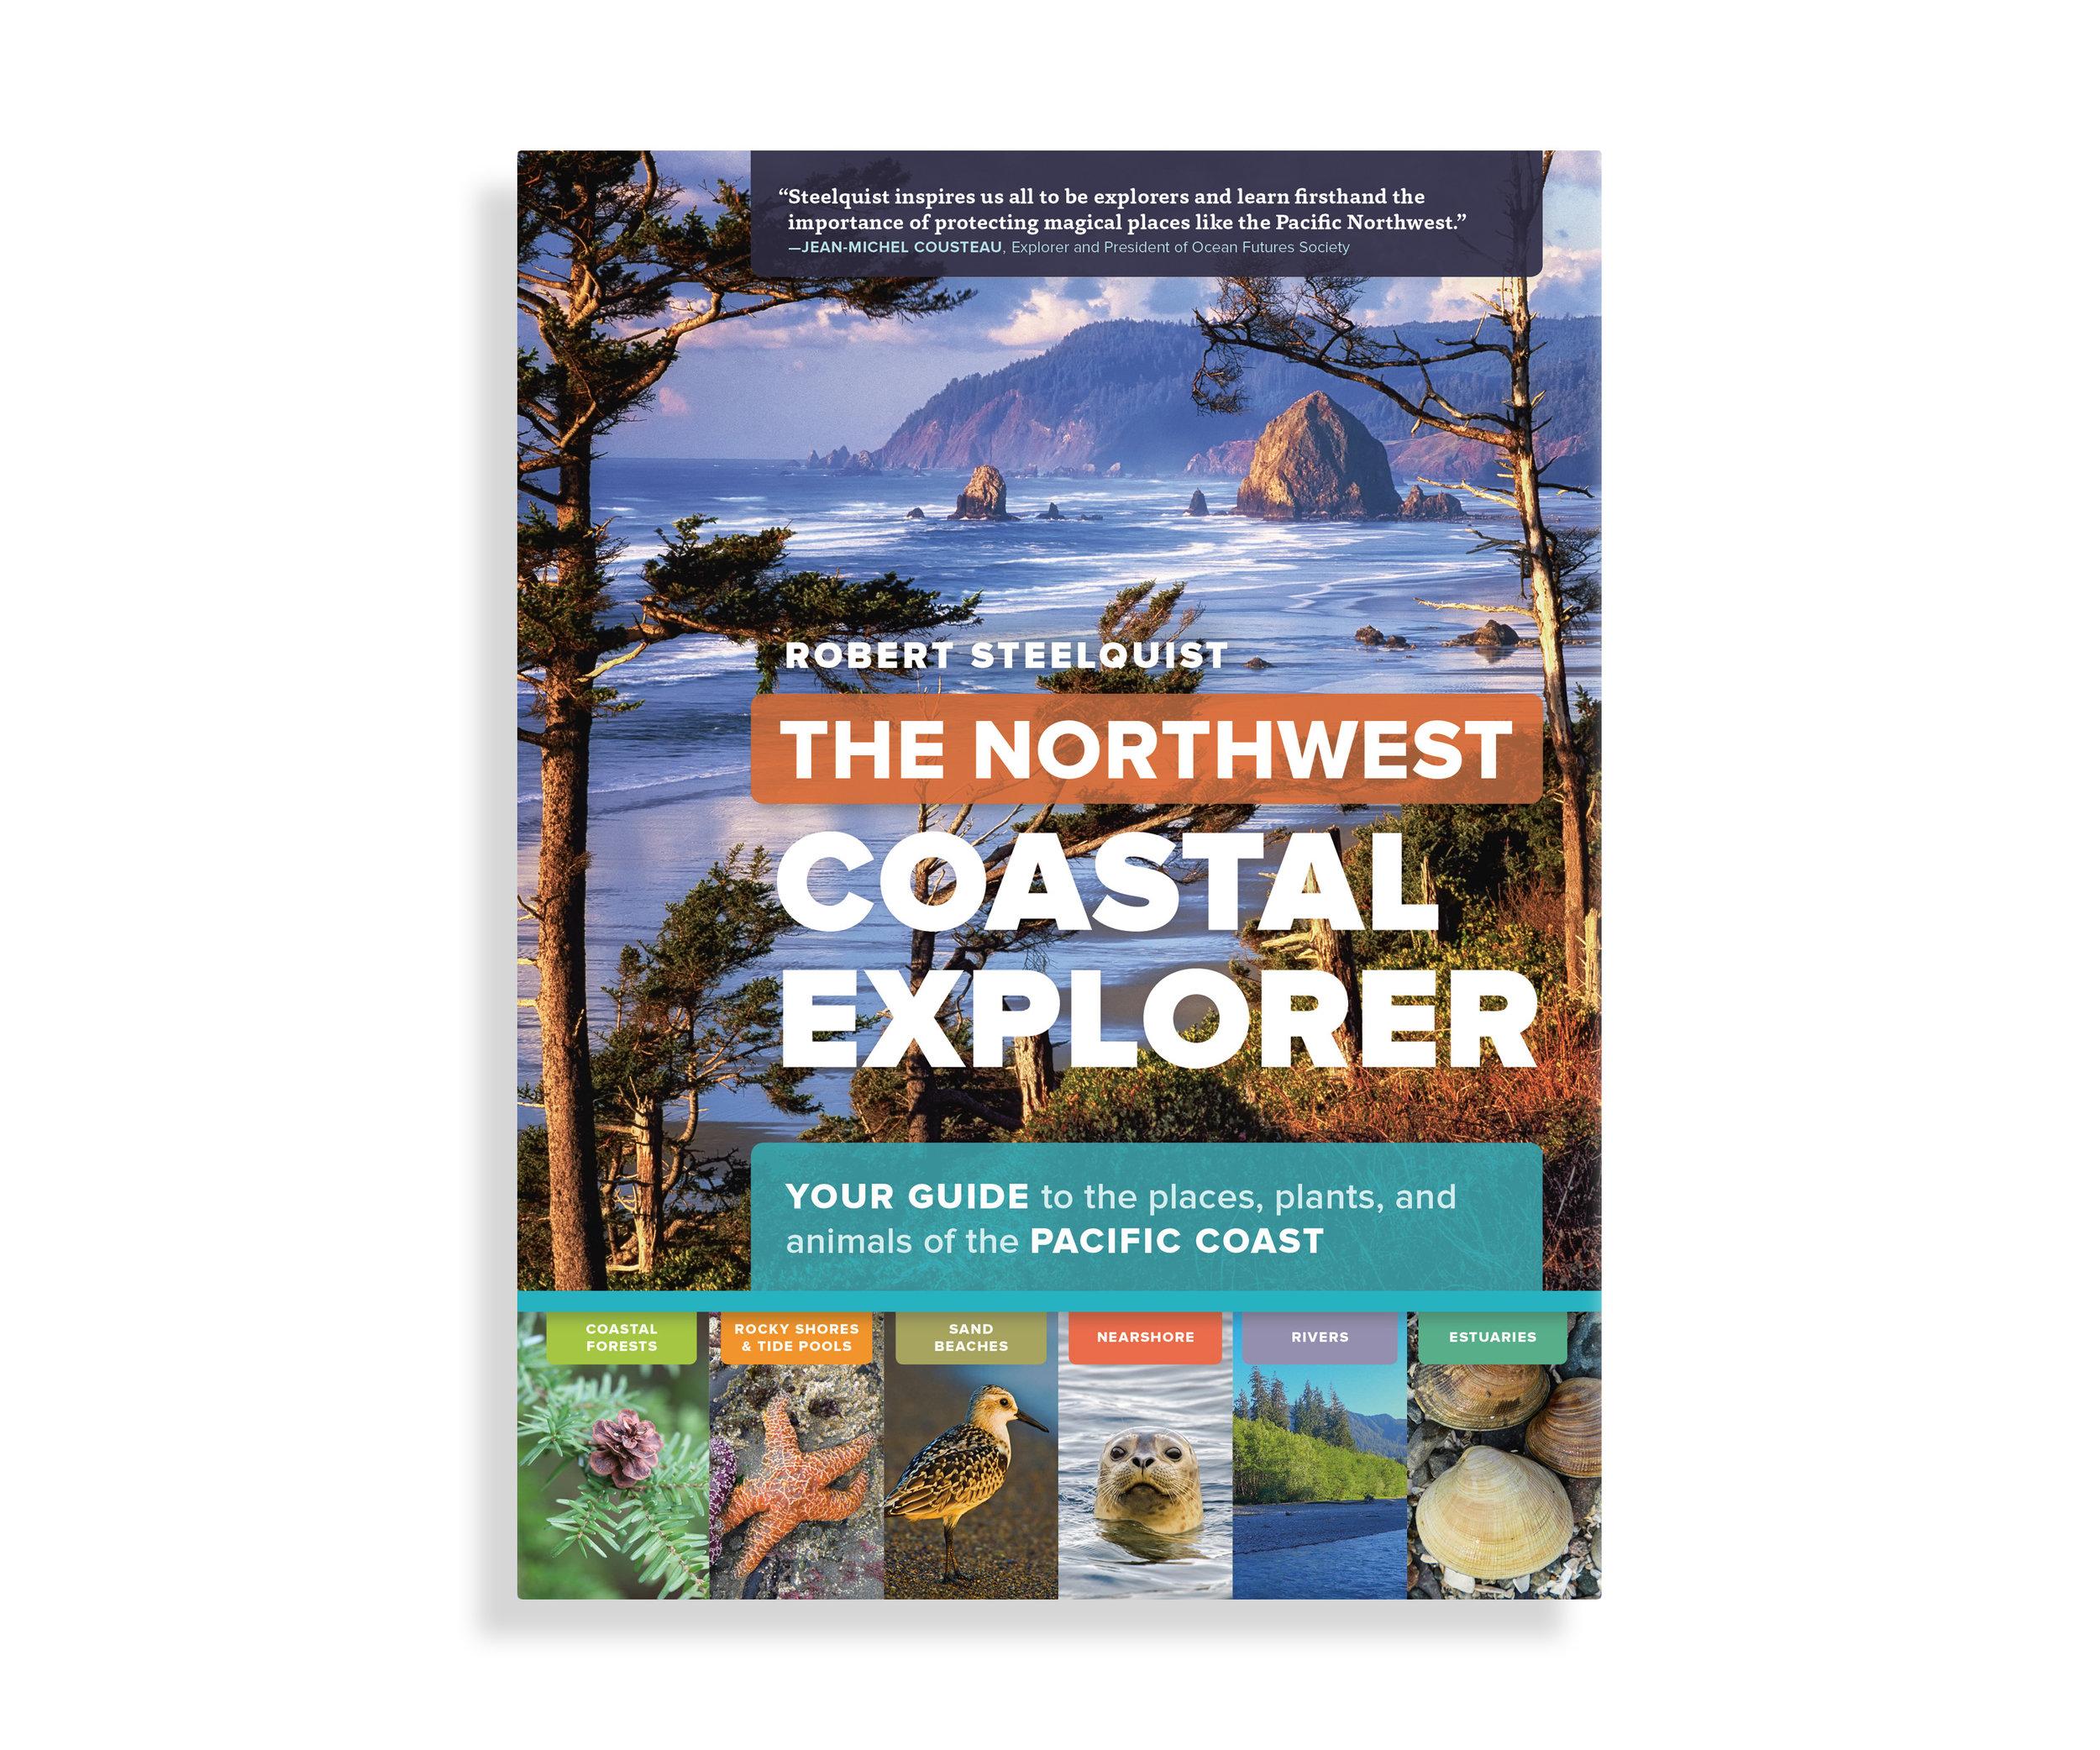 book_coastalex_cover_001.jpg